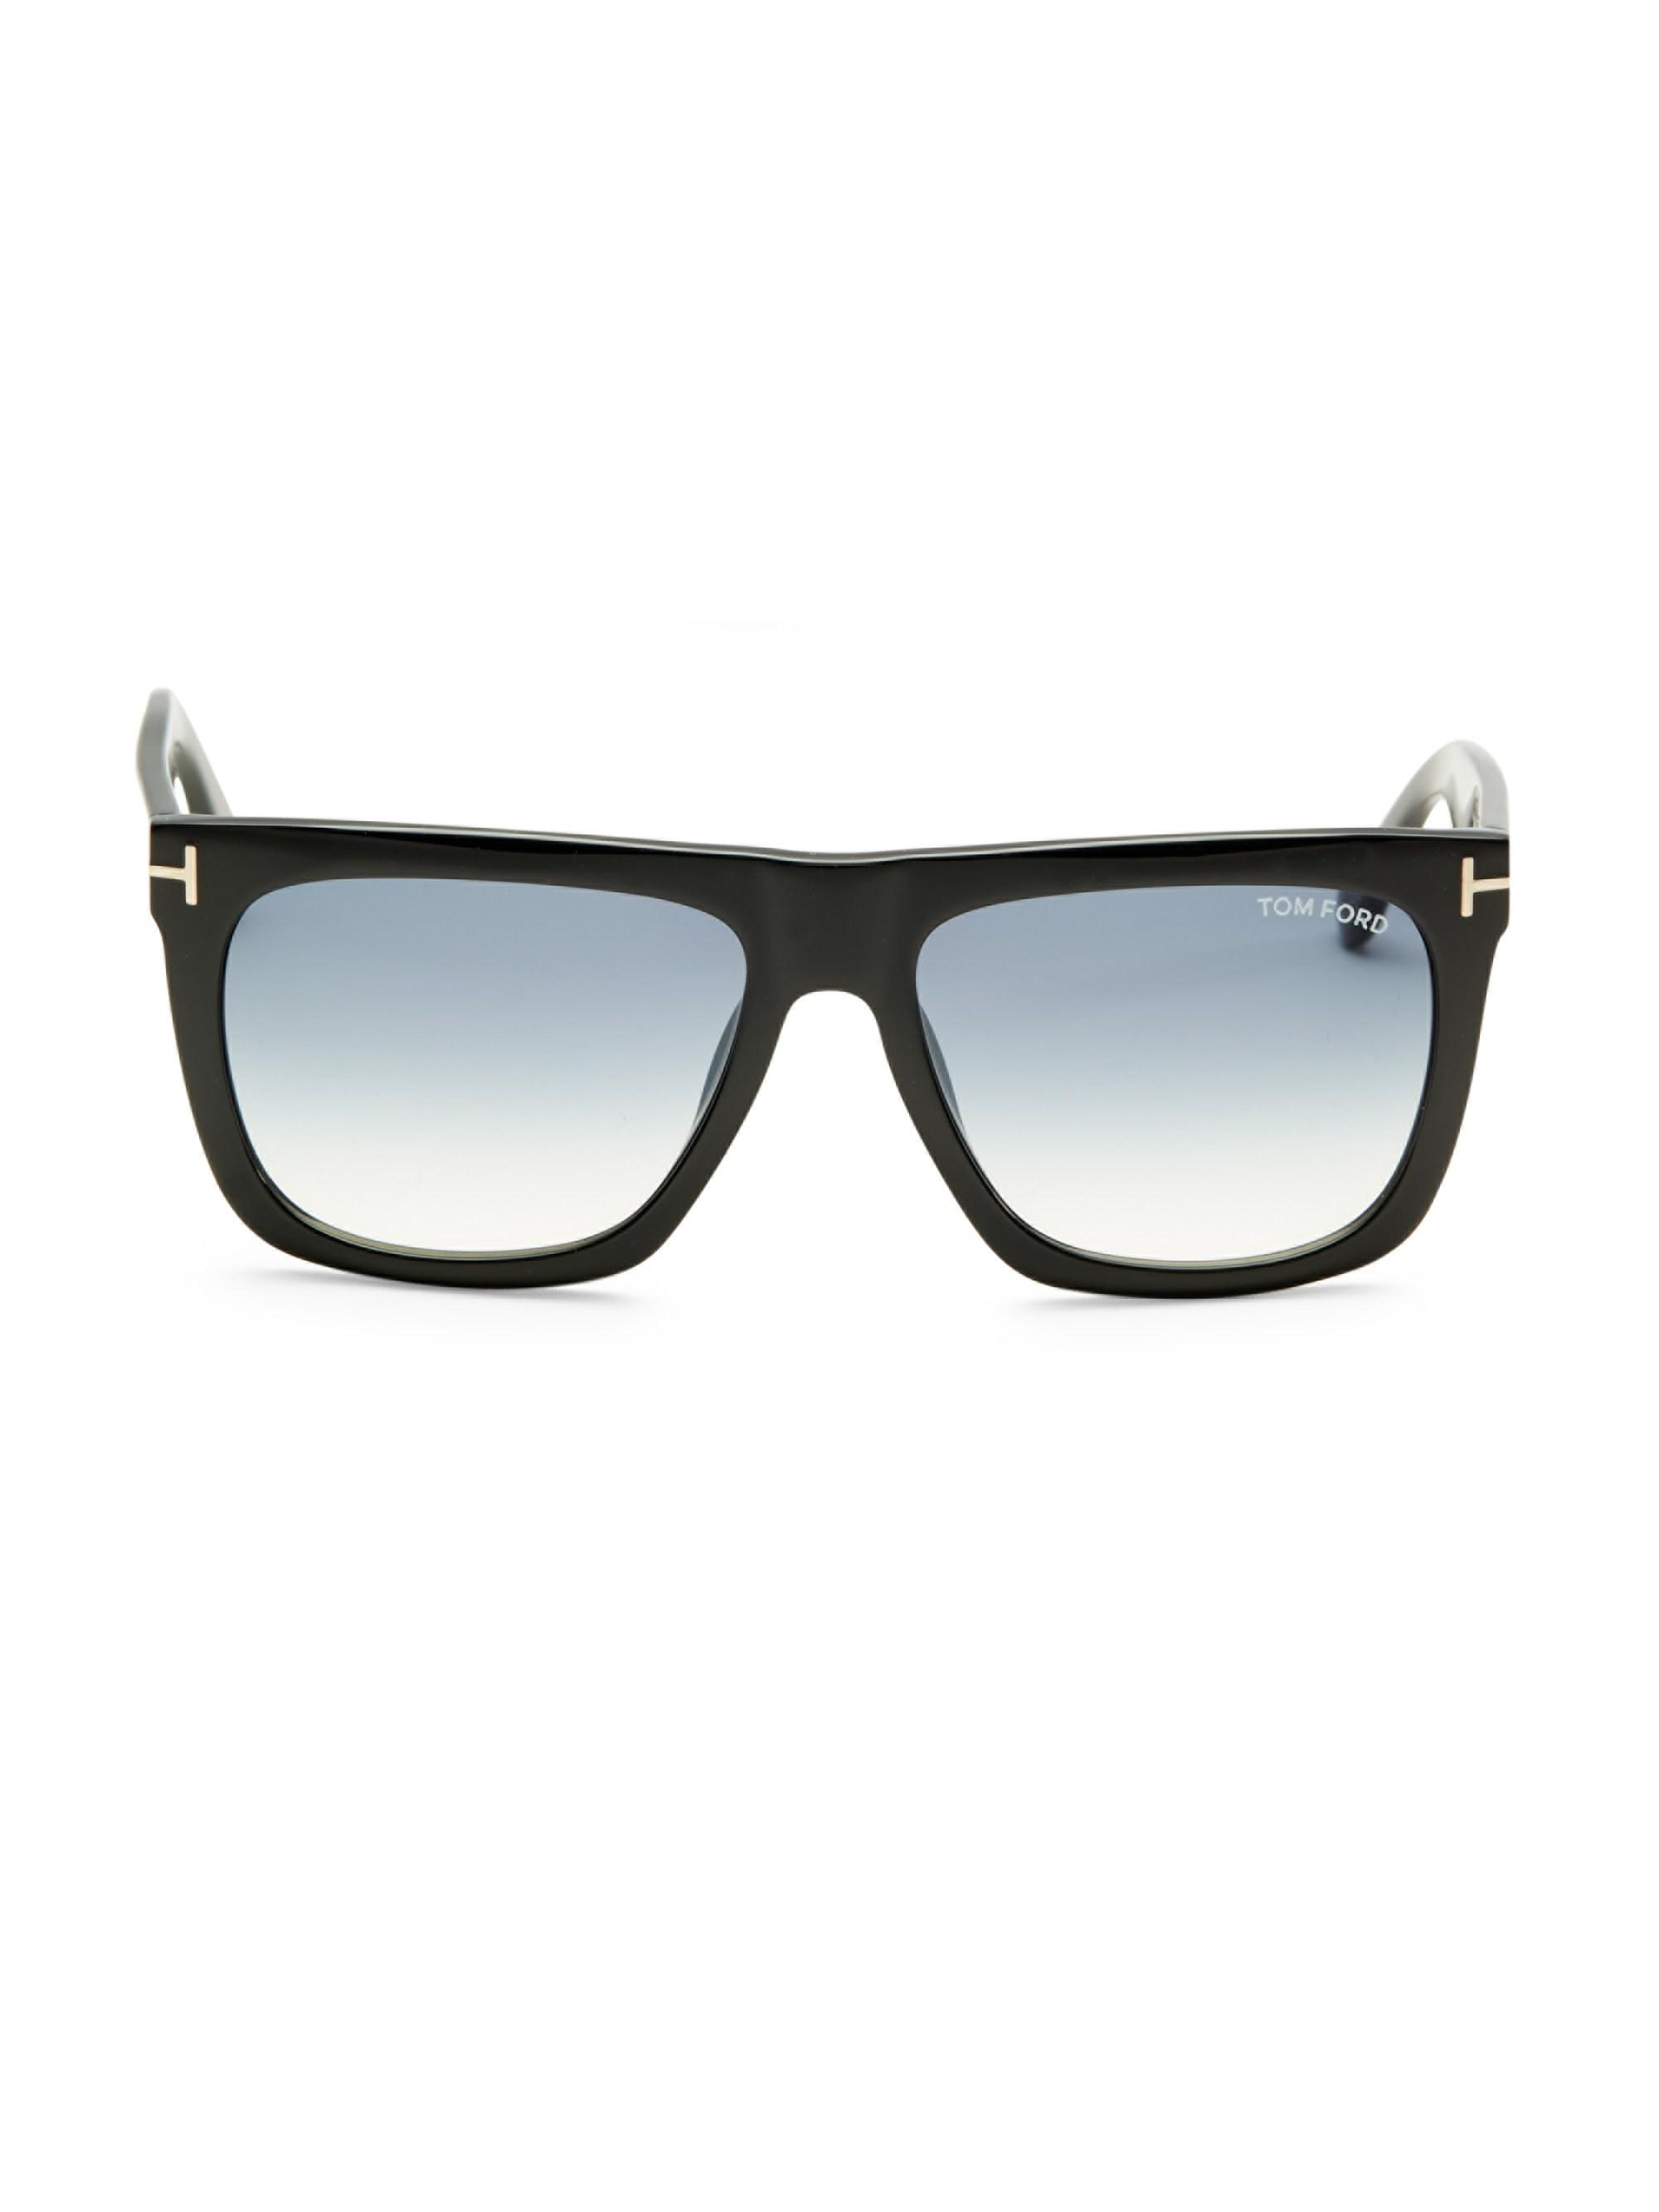 8d1ffdd83d Tom Ford - Black Morgan 57mm Soft Square Sunglasses for Men - Lyst. View  fullscreen